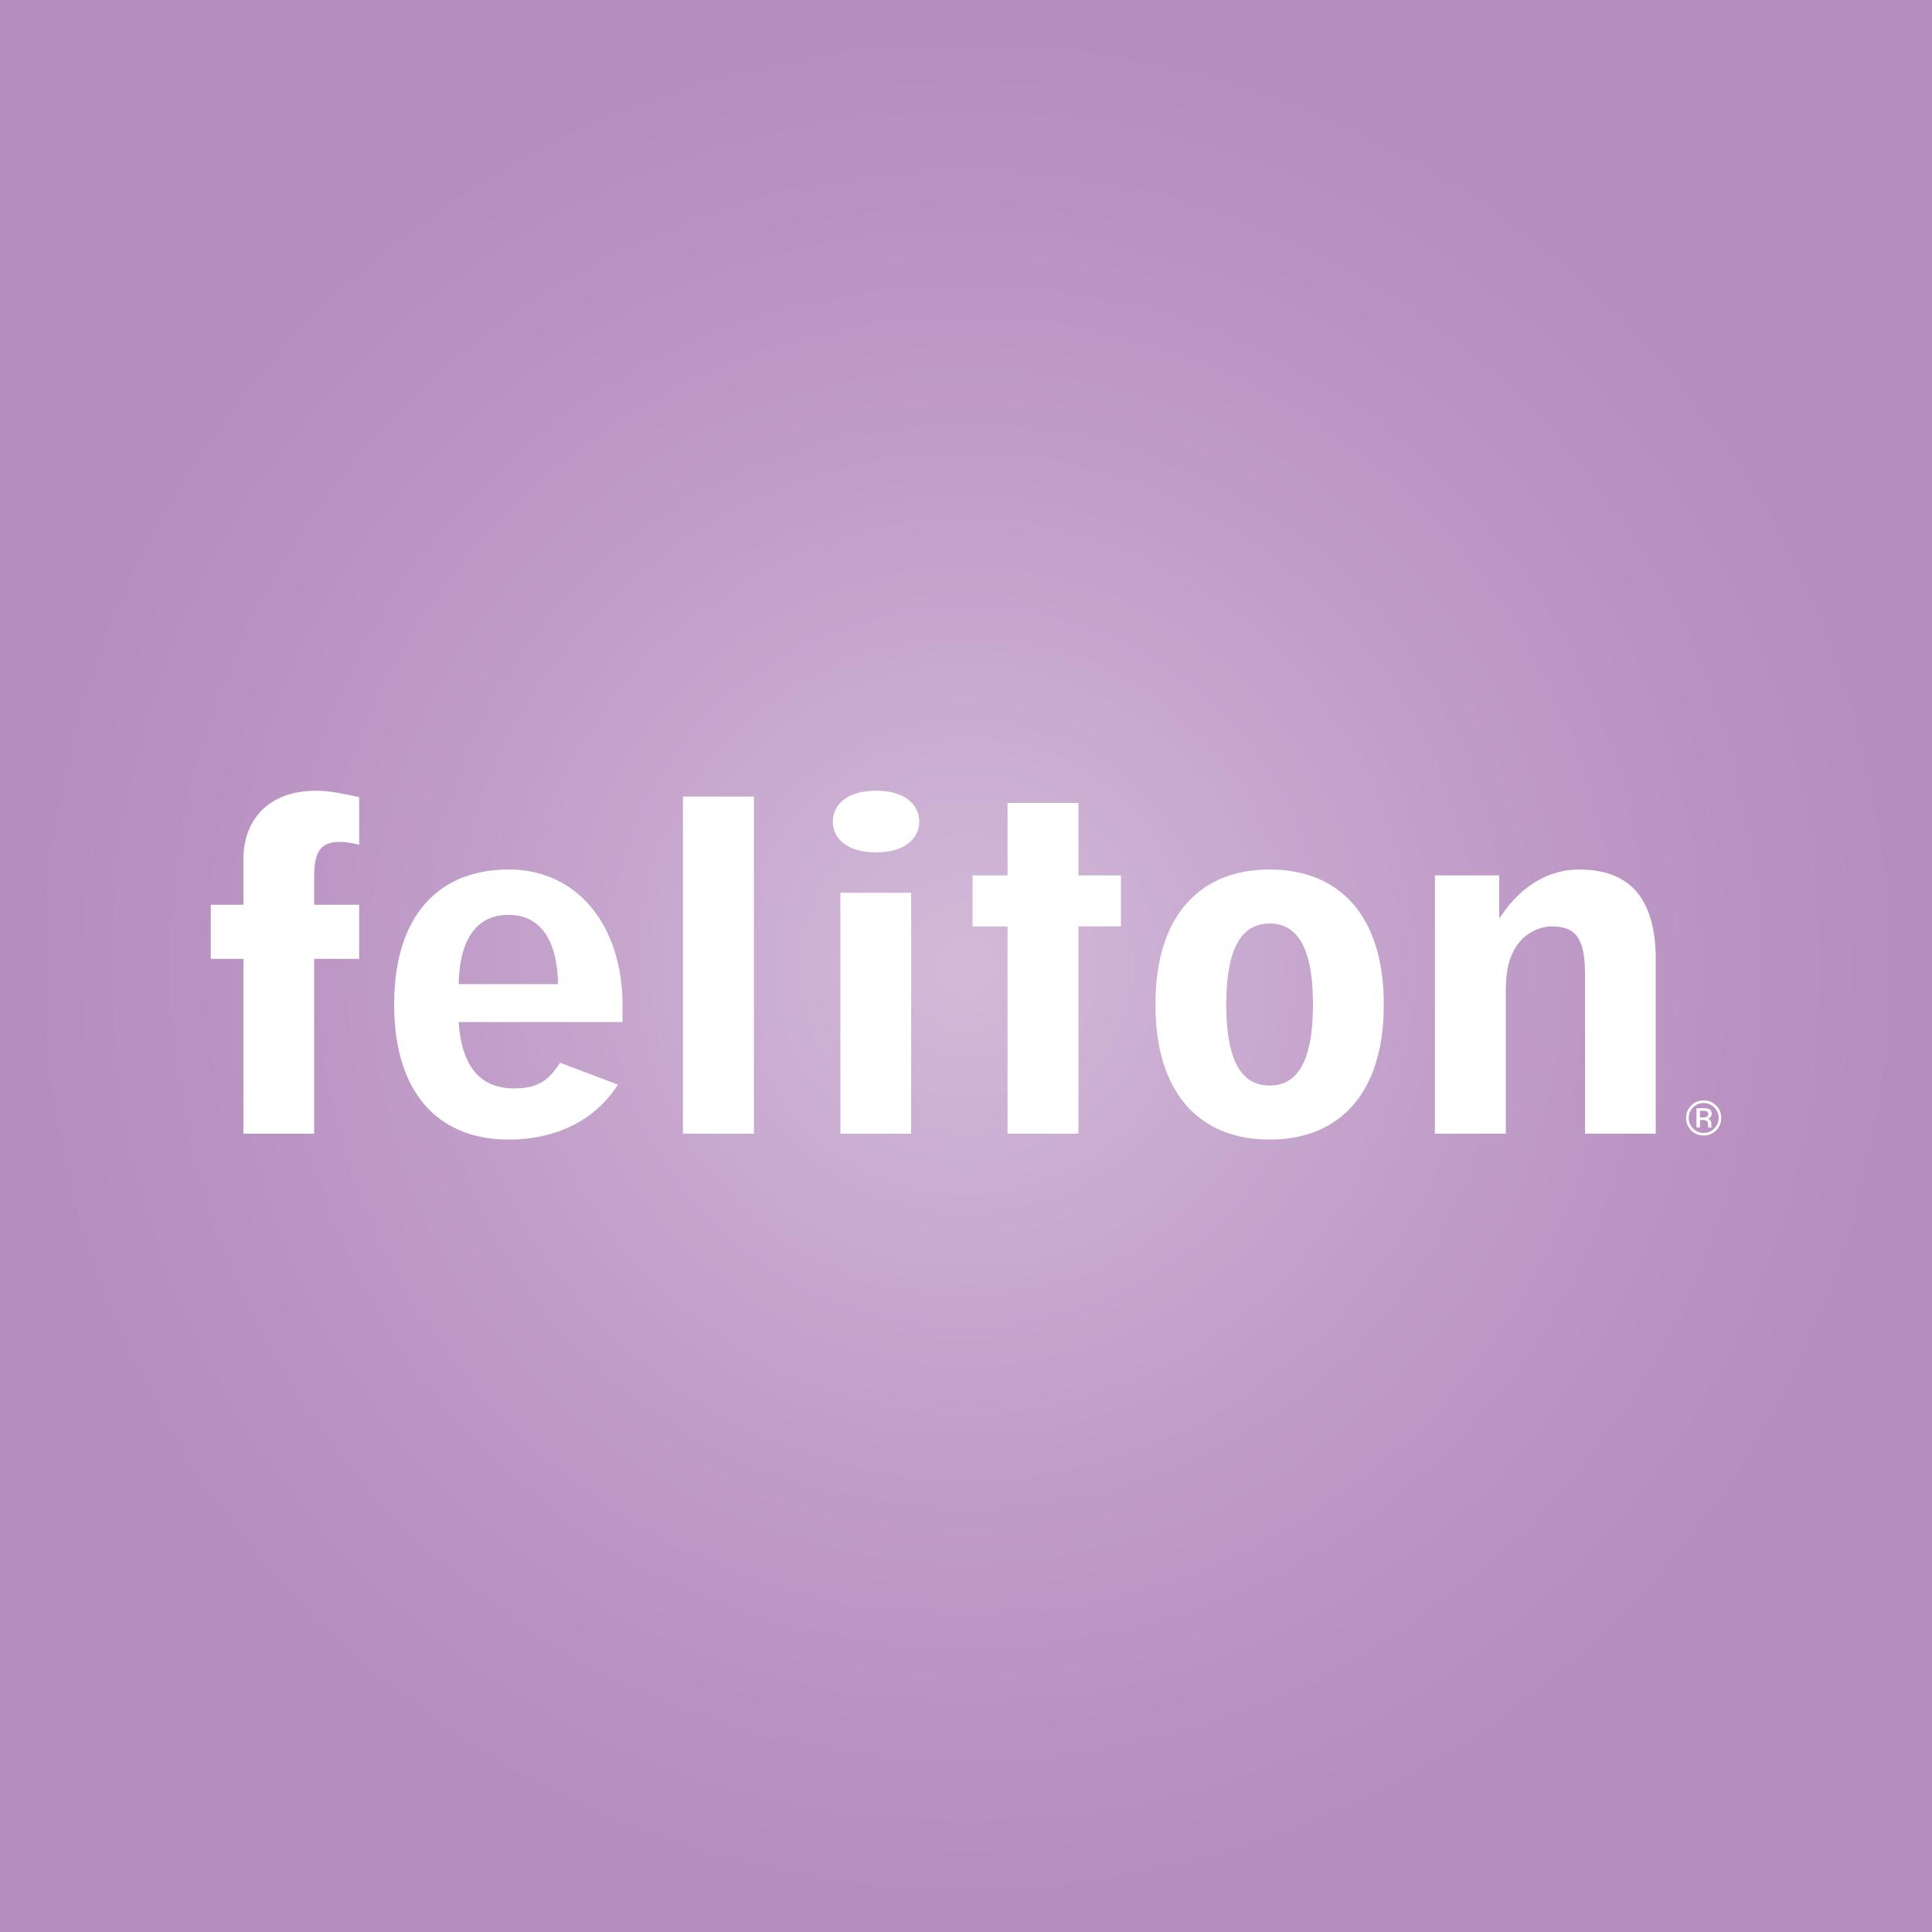 feliton bei DAS FUTTERHAUS